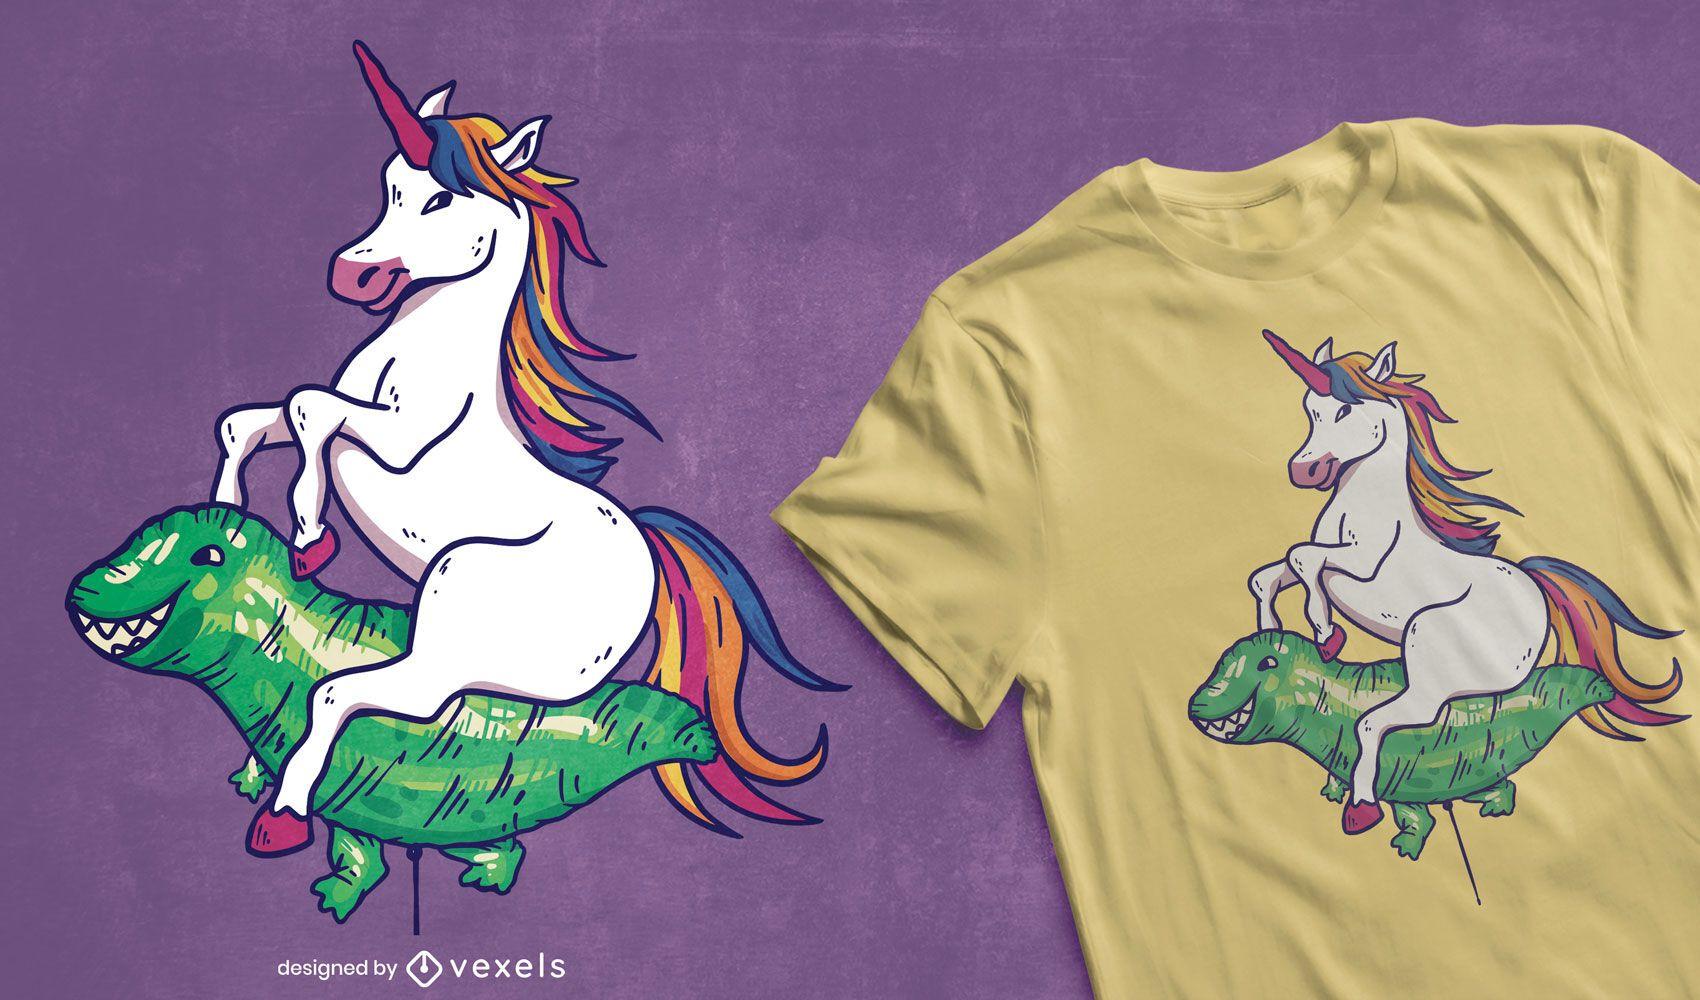 Unicorn riding balloon t-shirt design